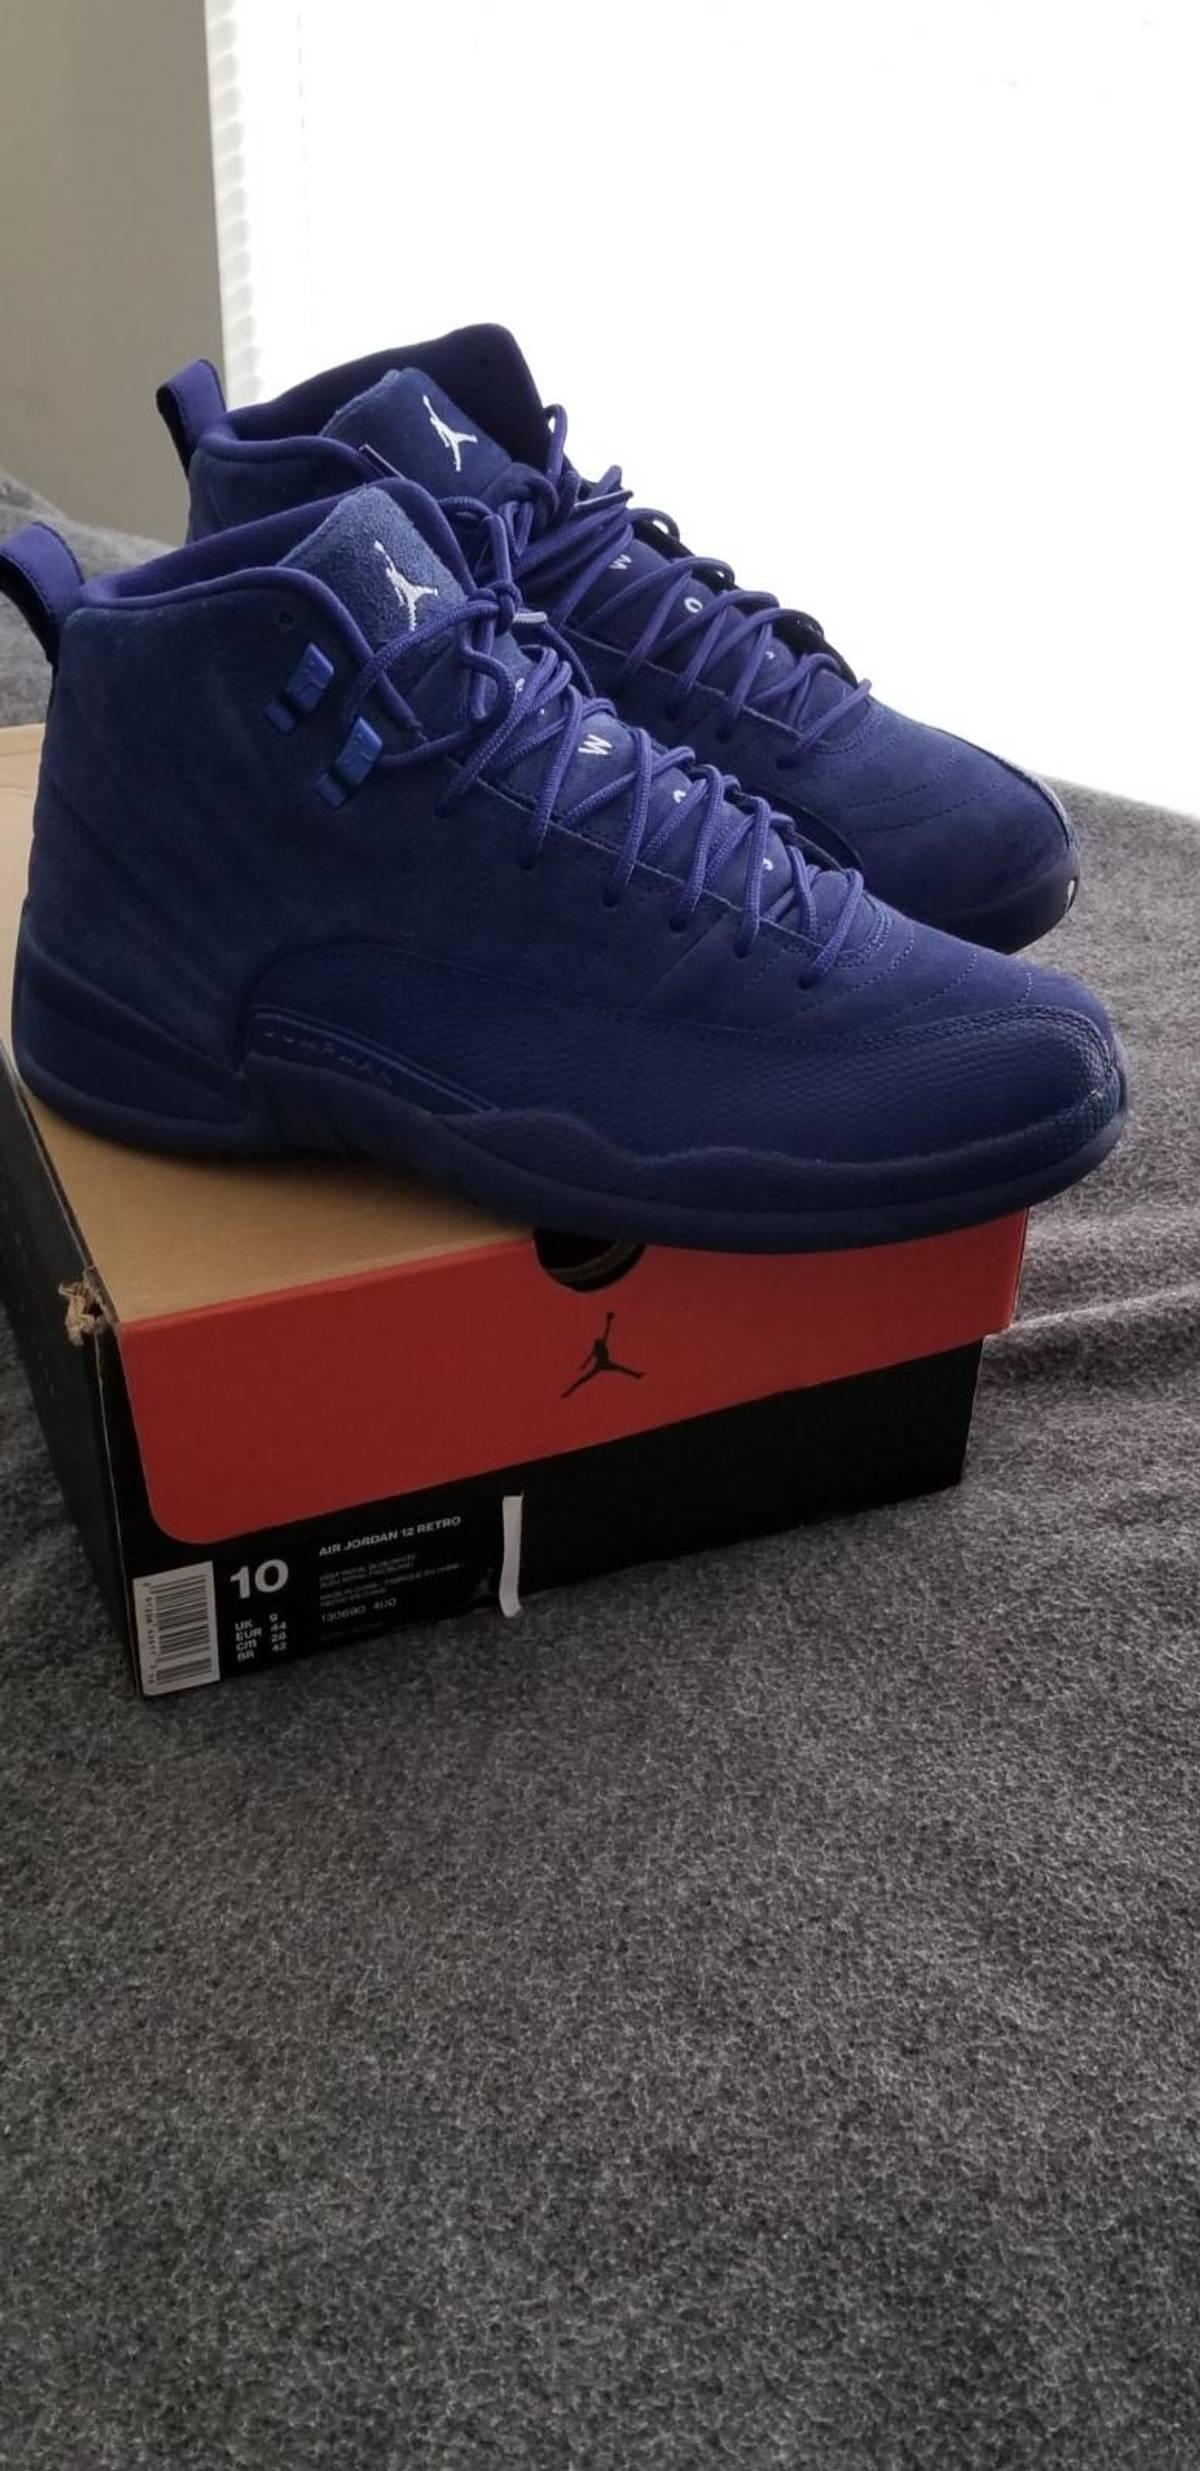 the best attitude 2ad2b 2da39 Jordan Brand Air Jordan 12s Blue Suede Size 10 $117